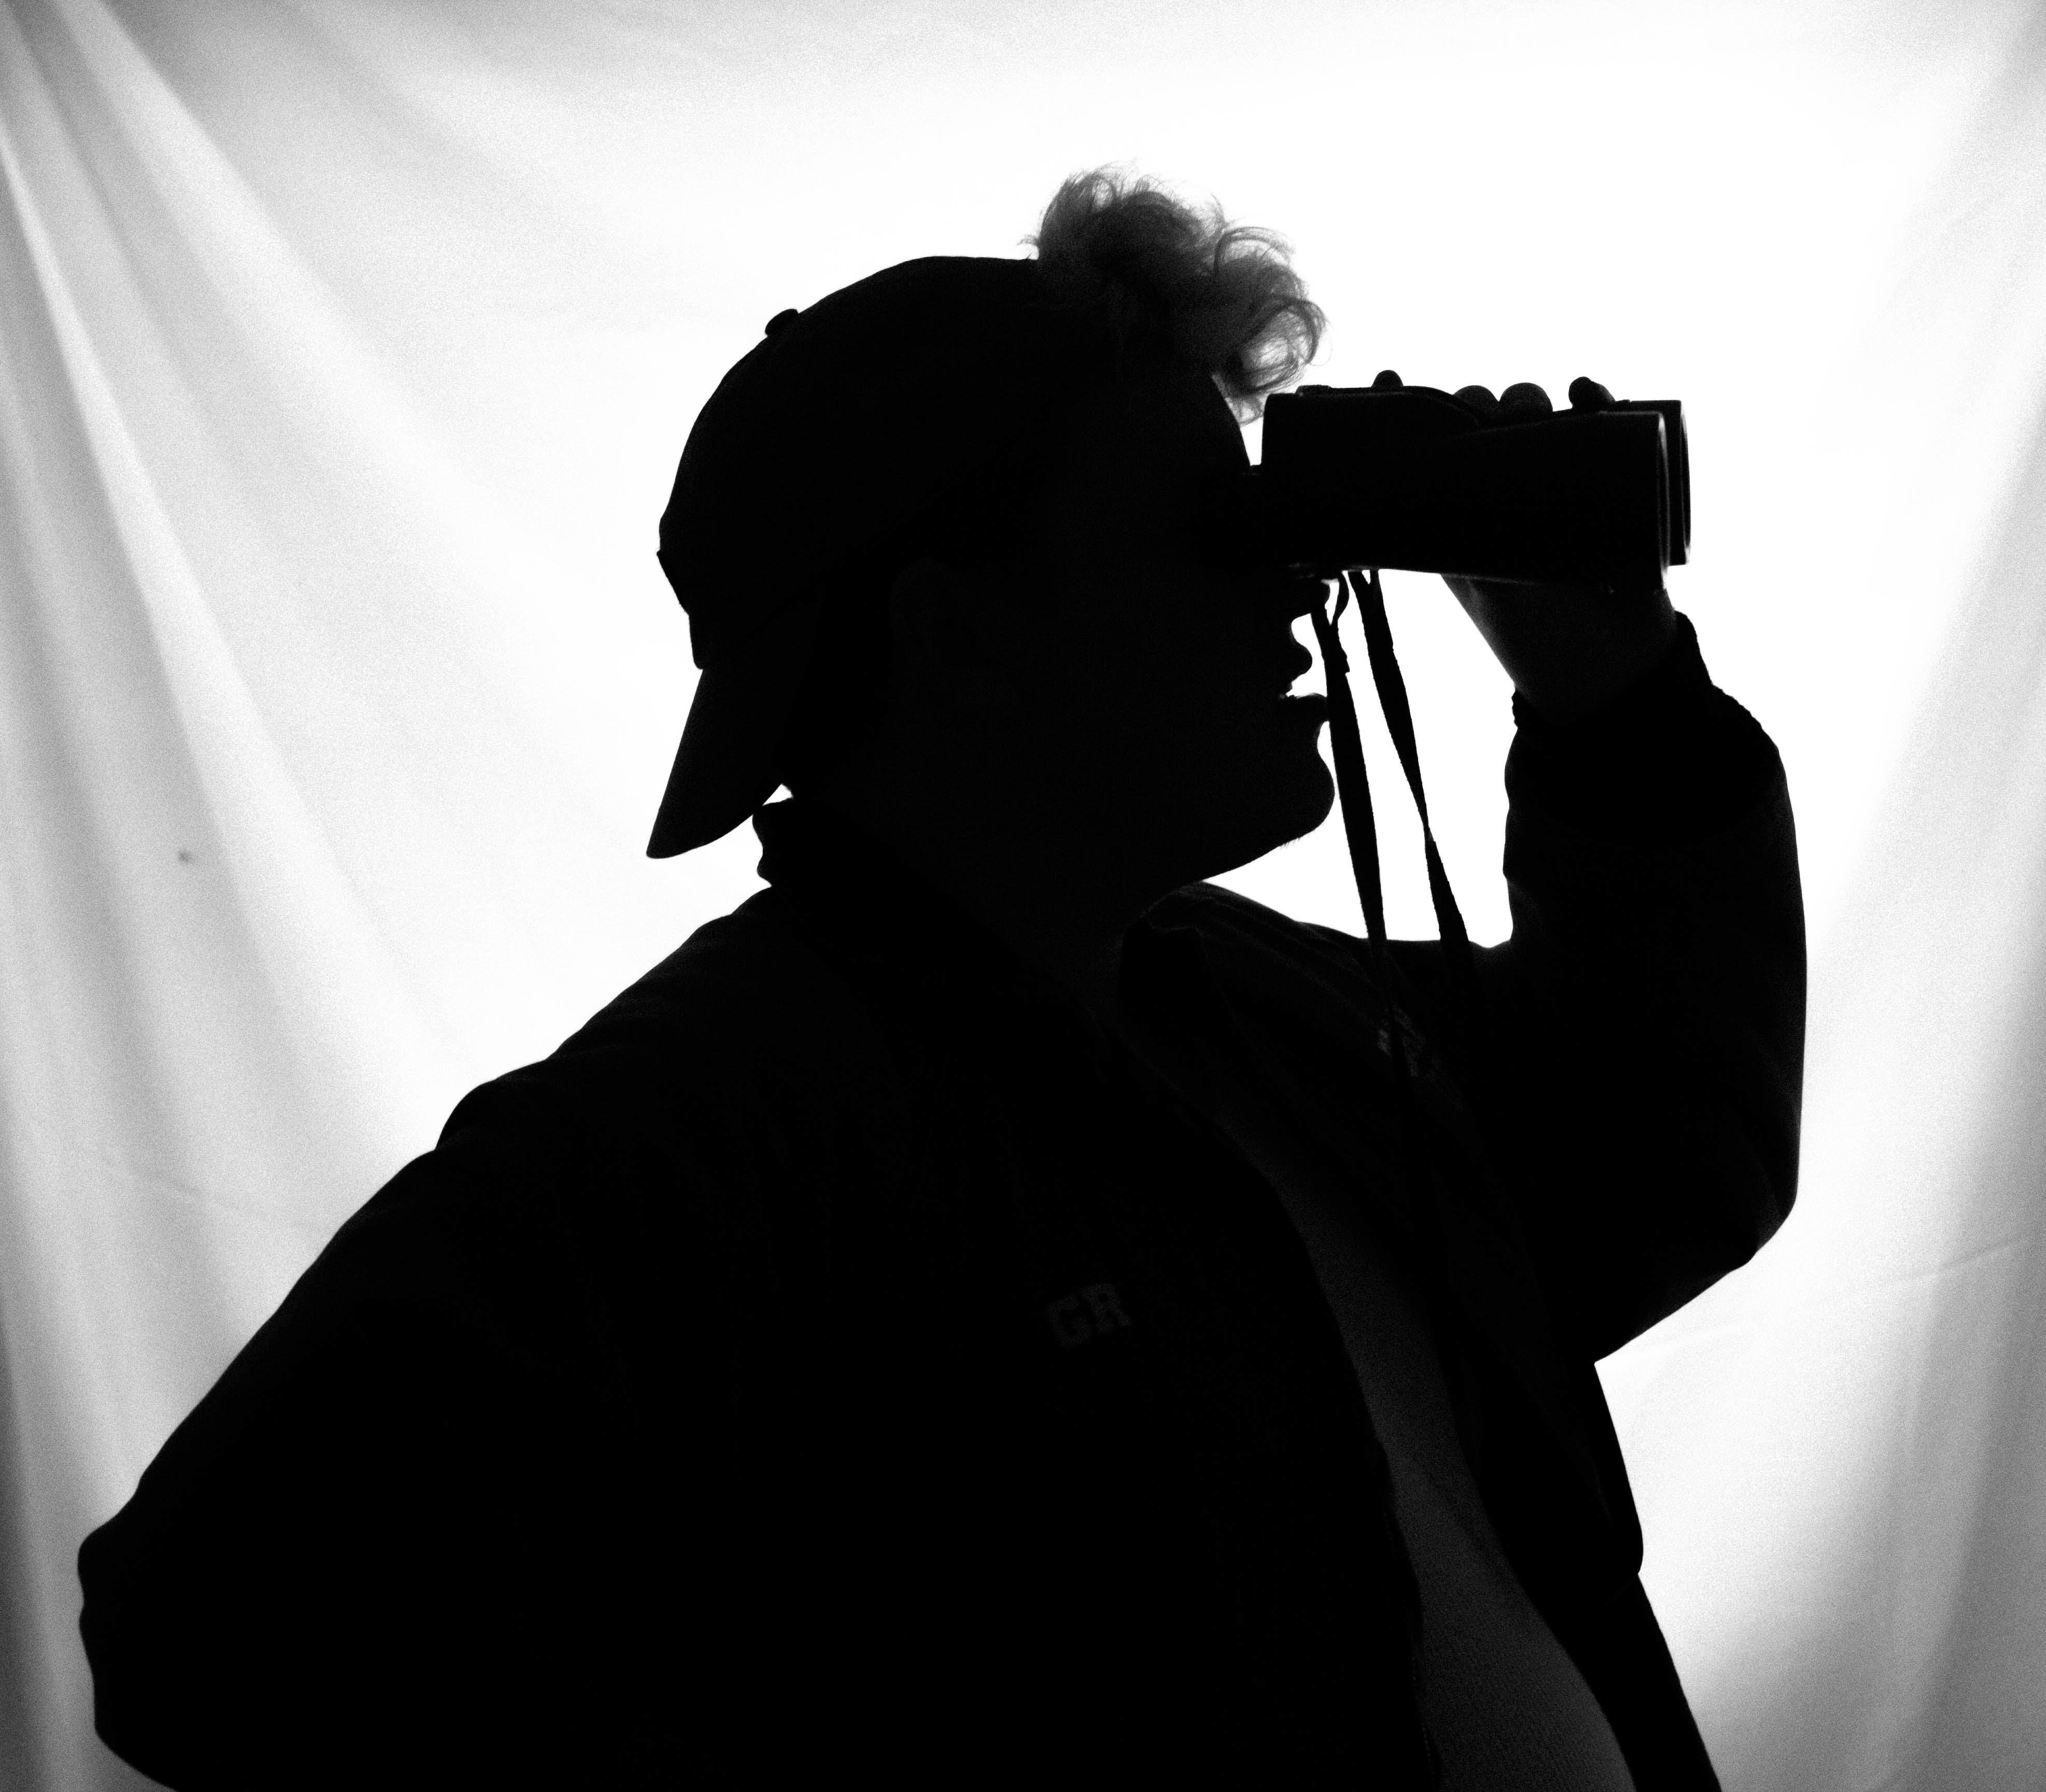 Free stock photo of binoculars, looking, silhouette